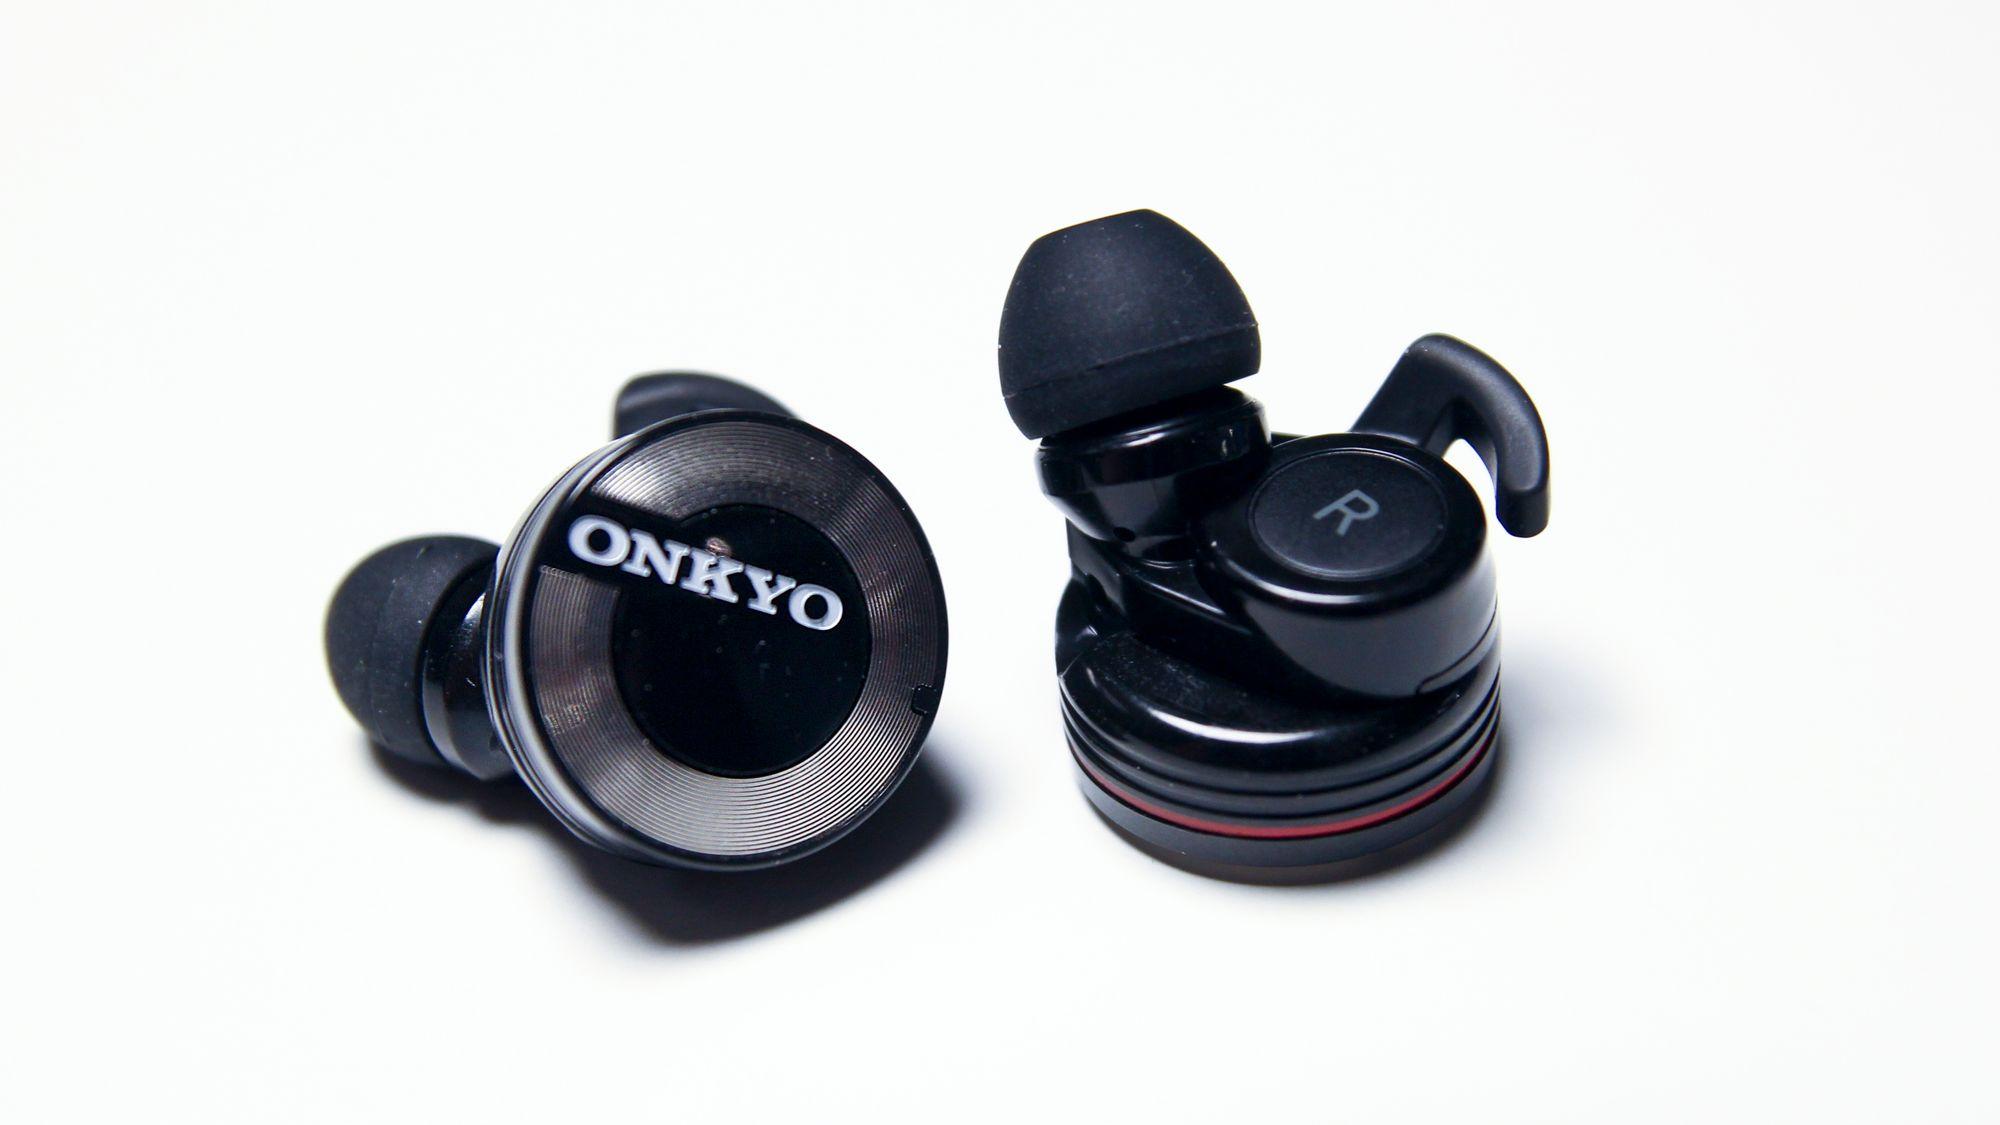 onkyo w800bt. onkyo w800bt er rimelig store plugger, men sitter likevel godt i øret. de har w800bt